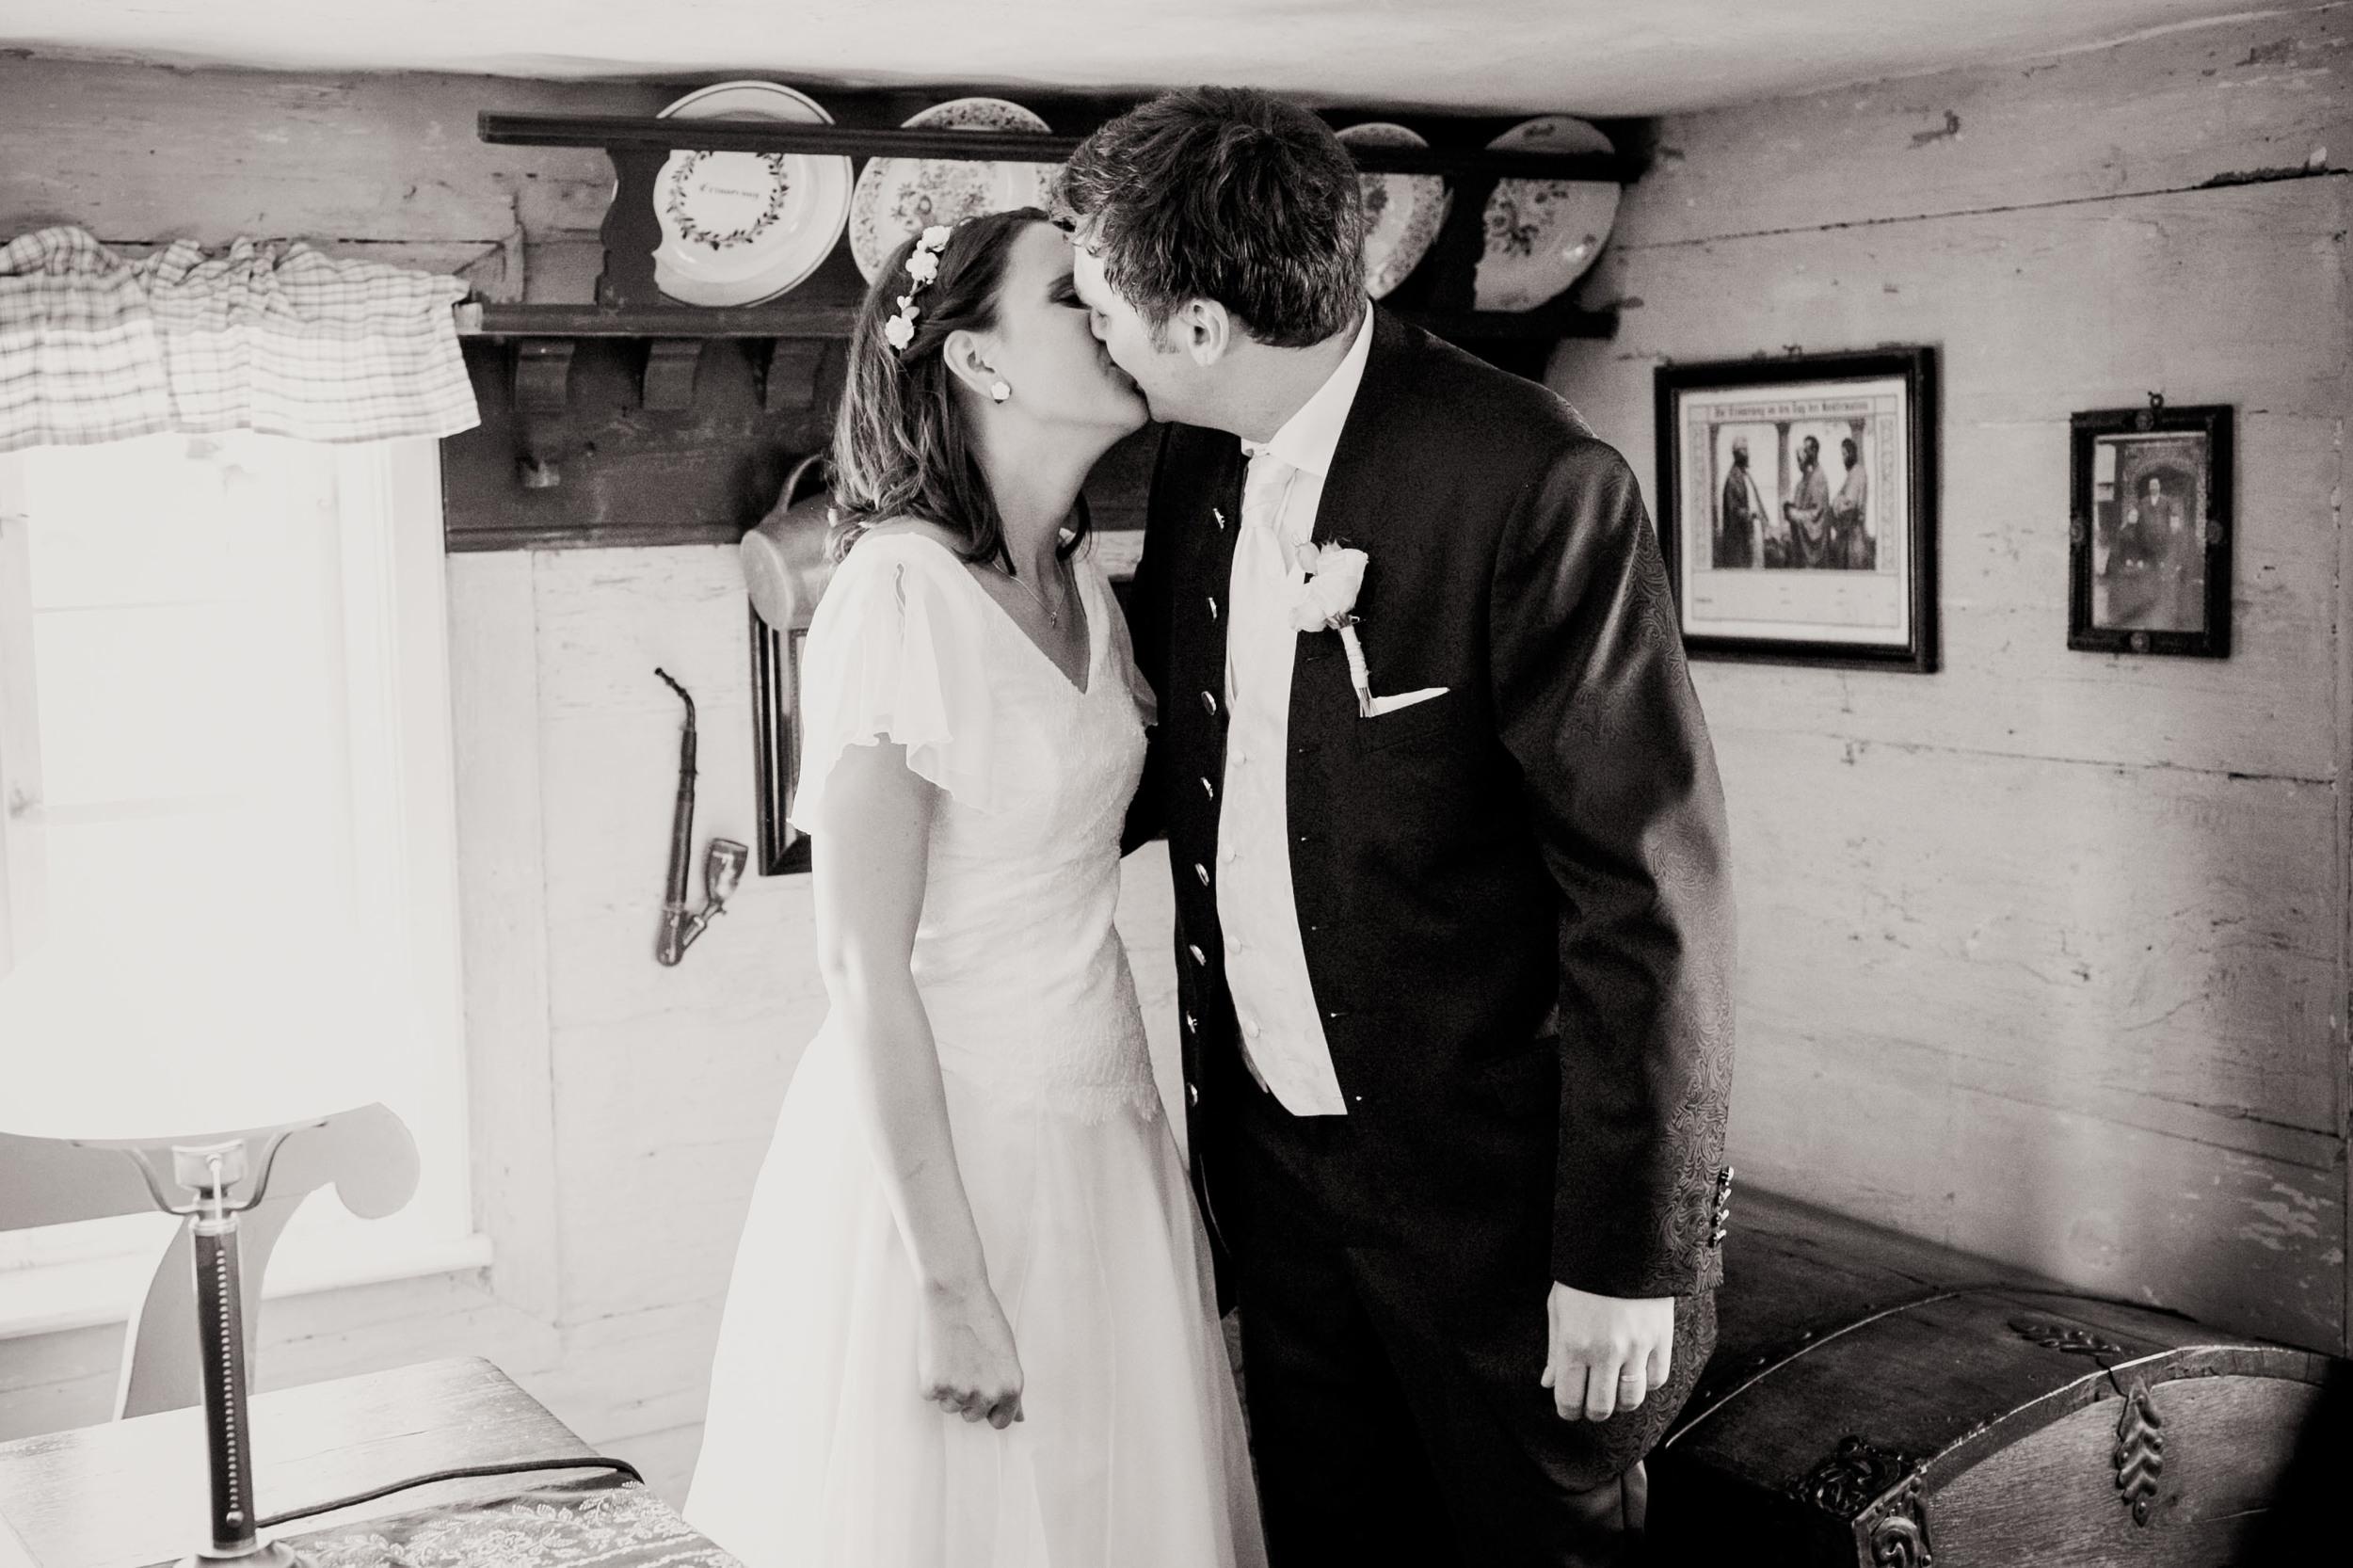 Spreewald Hochzeitsfotografie_Fran Burrows Fotografie-24.jpg